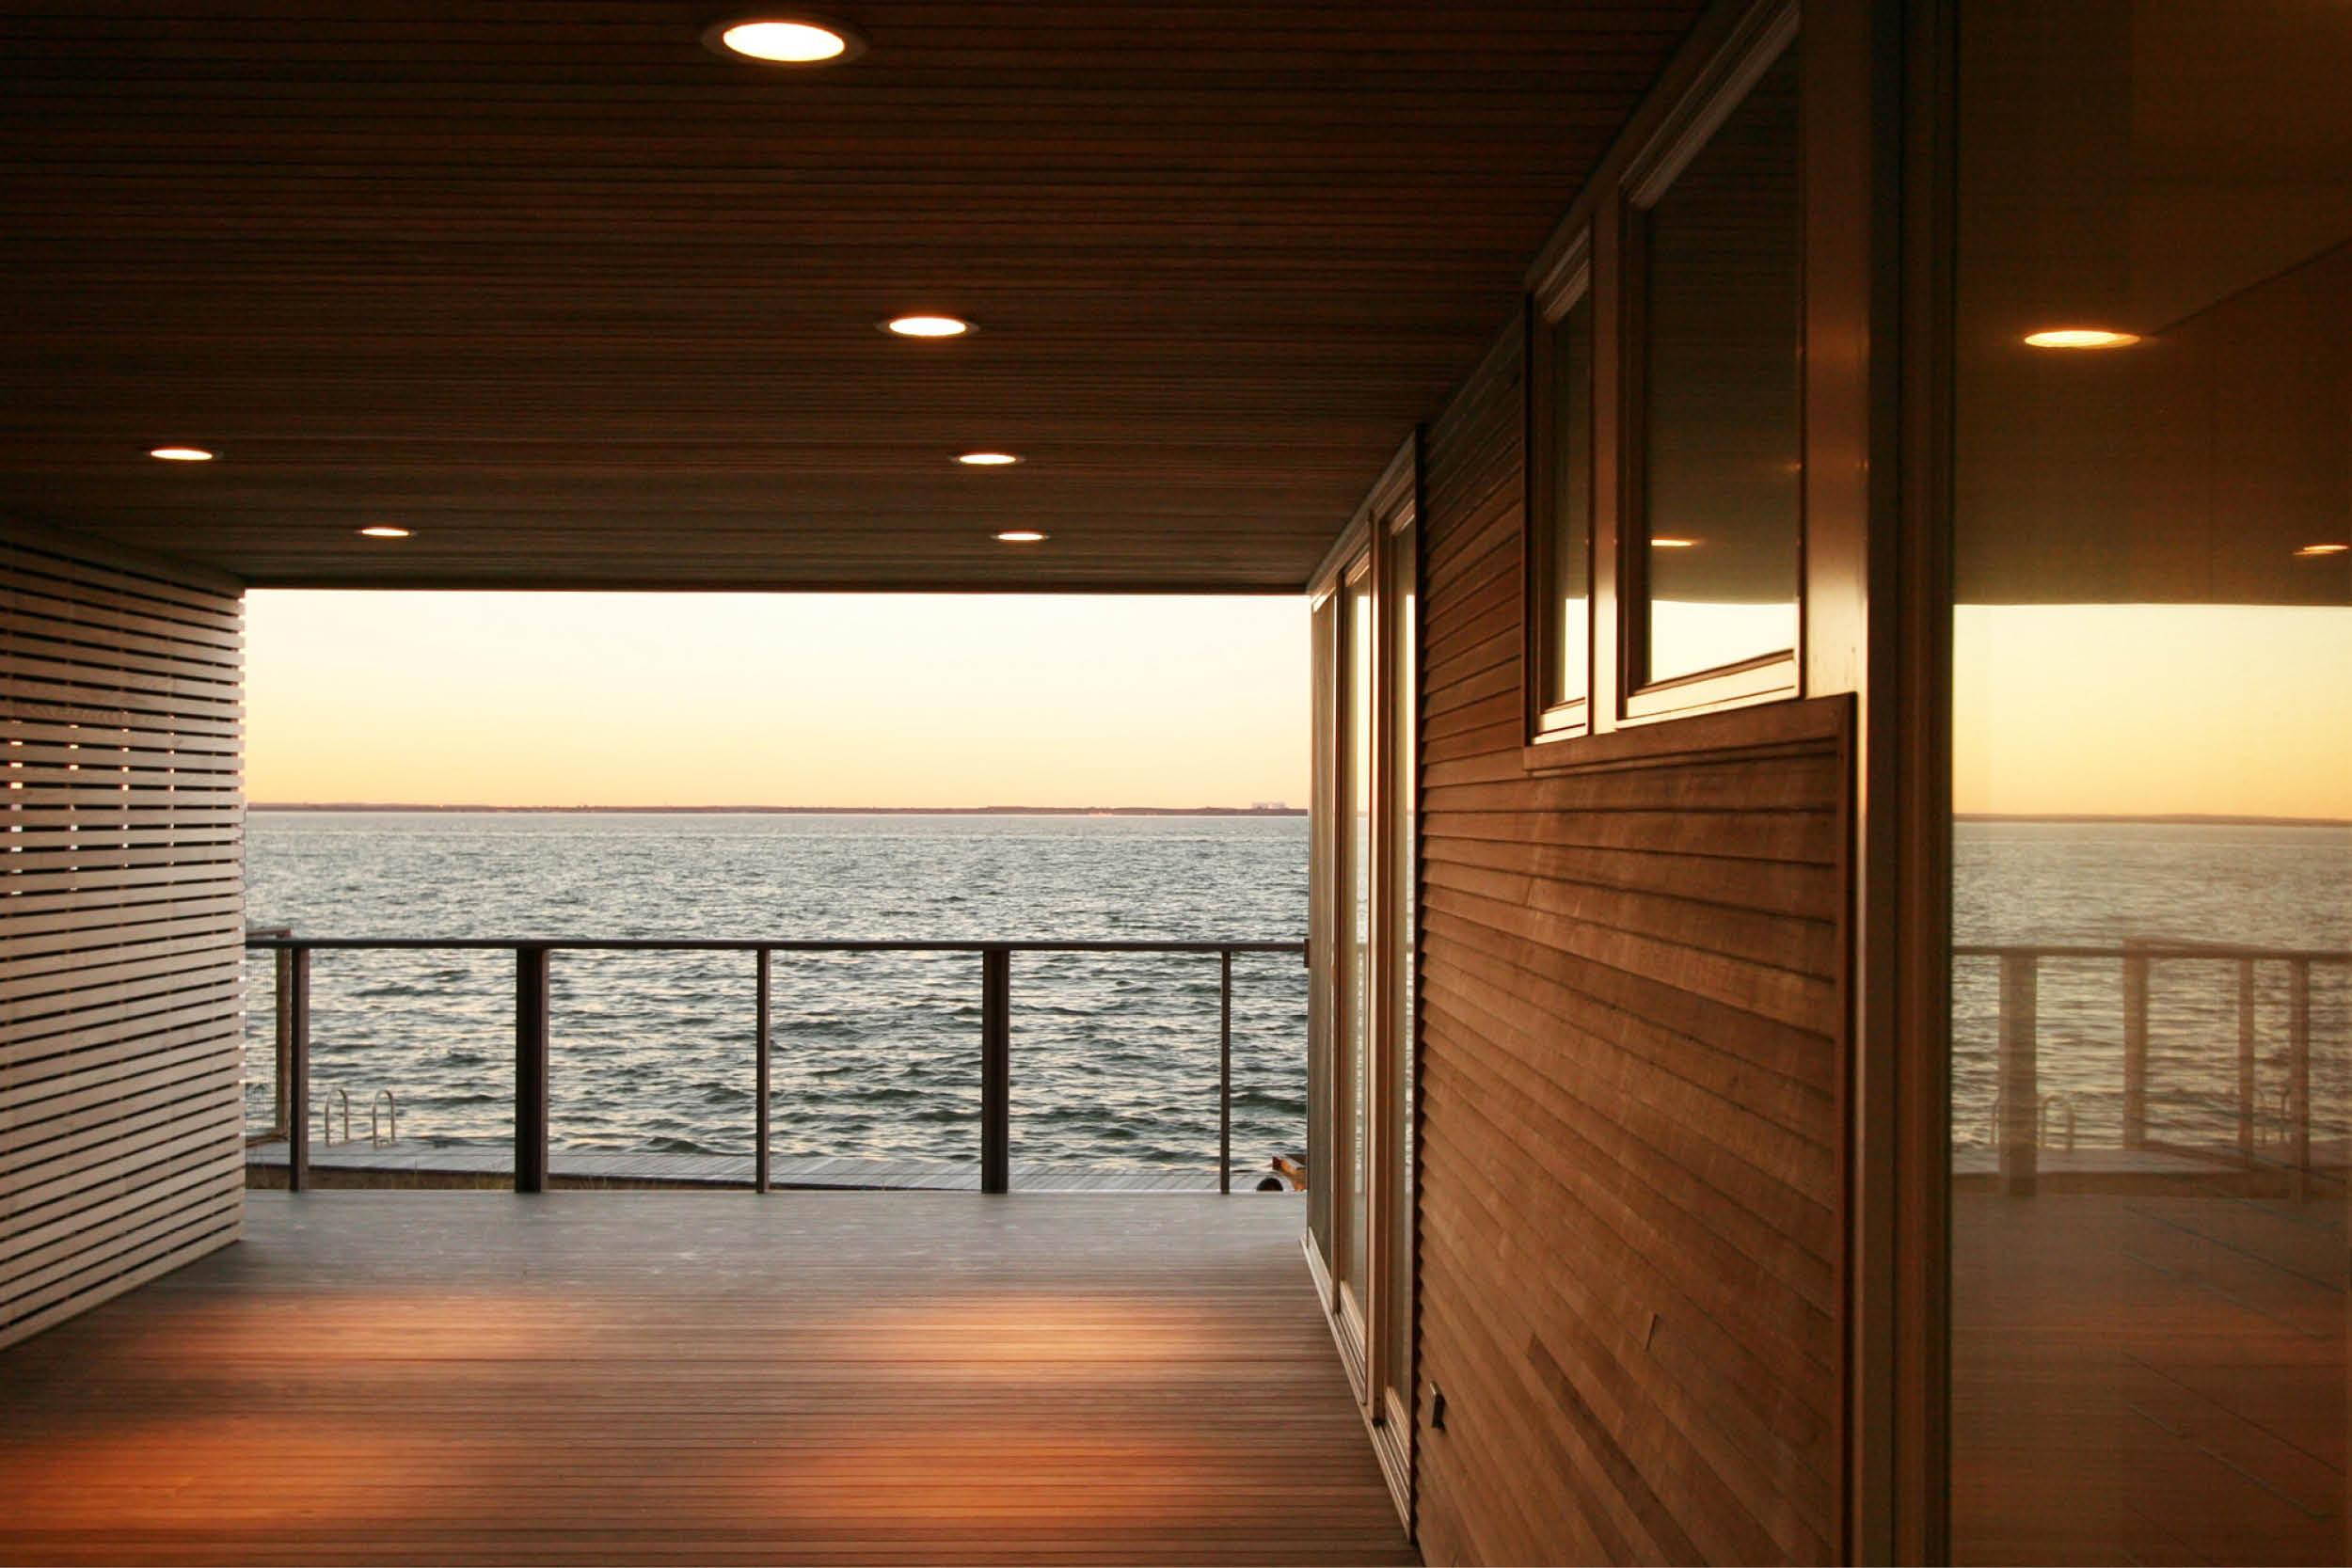 Modern Modular Prefab House | Cedar siding Ceiling Ipe Deck Beach Cable Rail | Fire Island New York | RES4